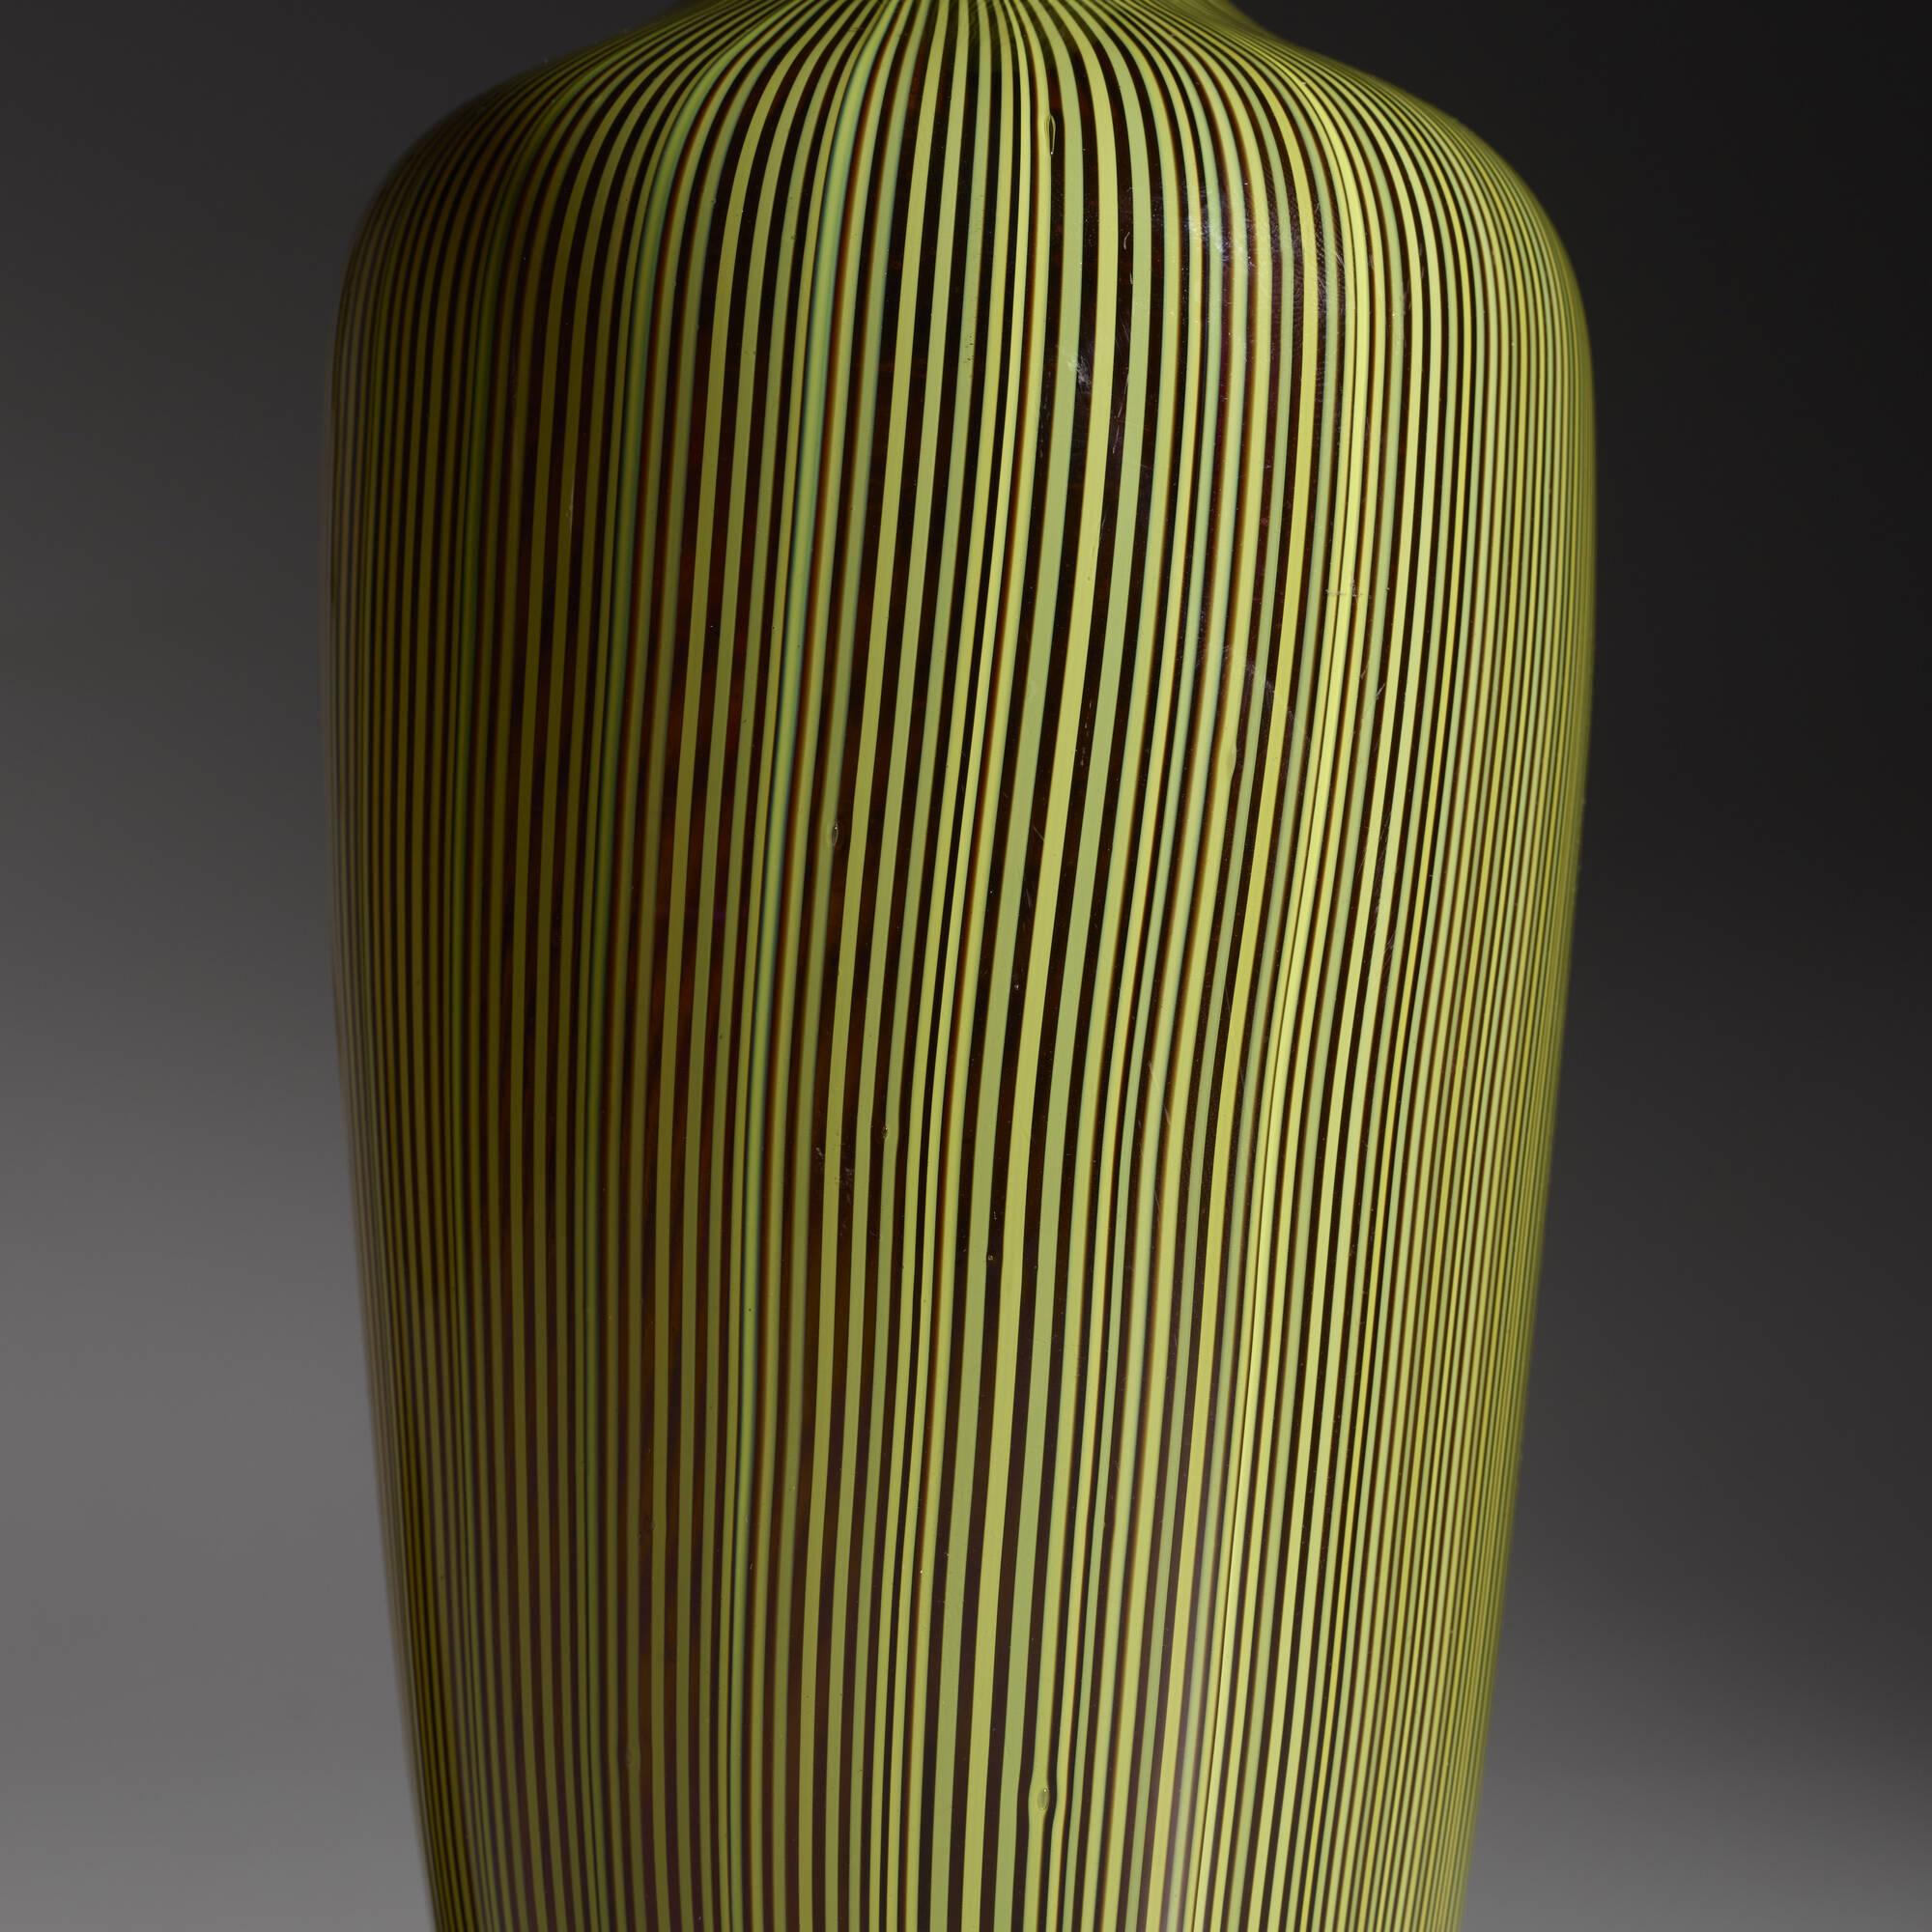 126 carlo scarpa tessuto vase model 3832 important italian 126 carlo scarpa tessuto vase model 3832 2 of 3 floridaeventfo Image collections